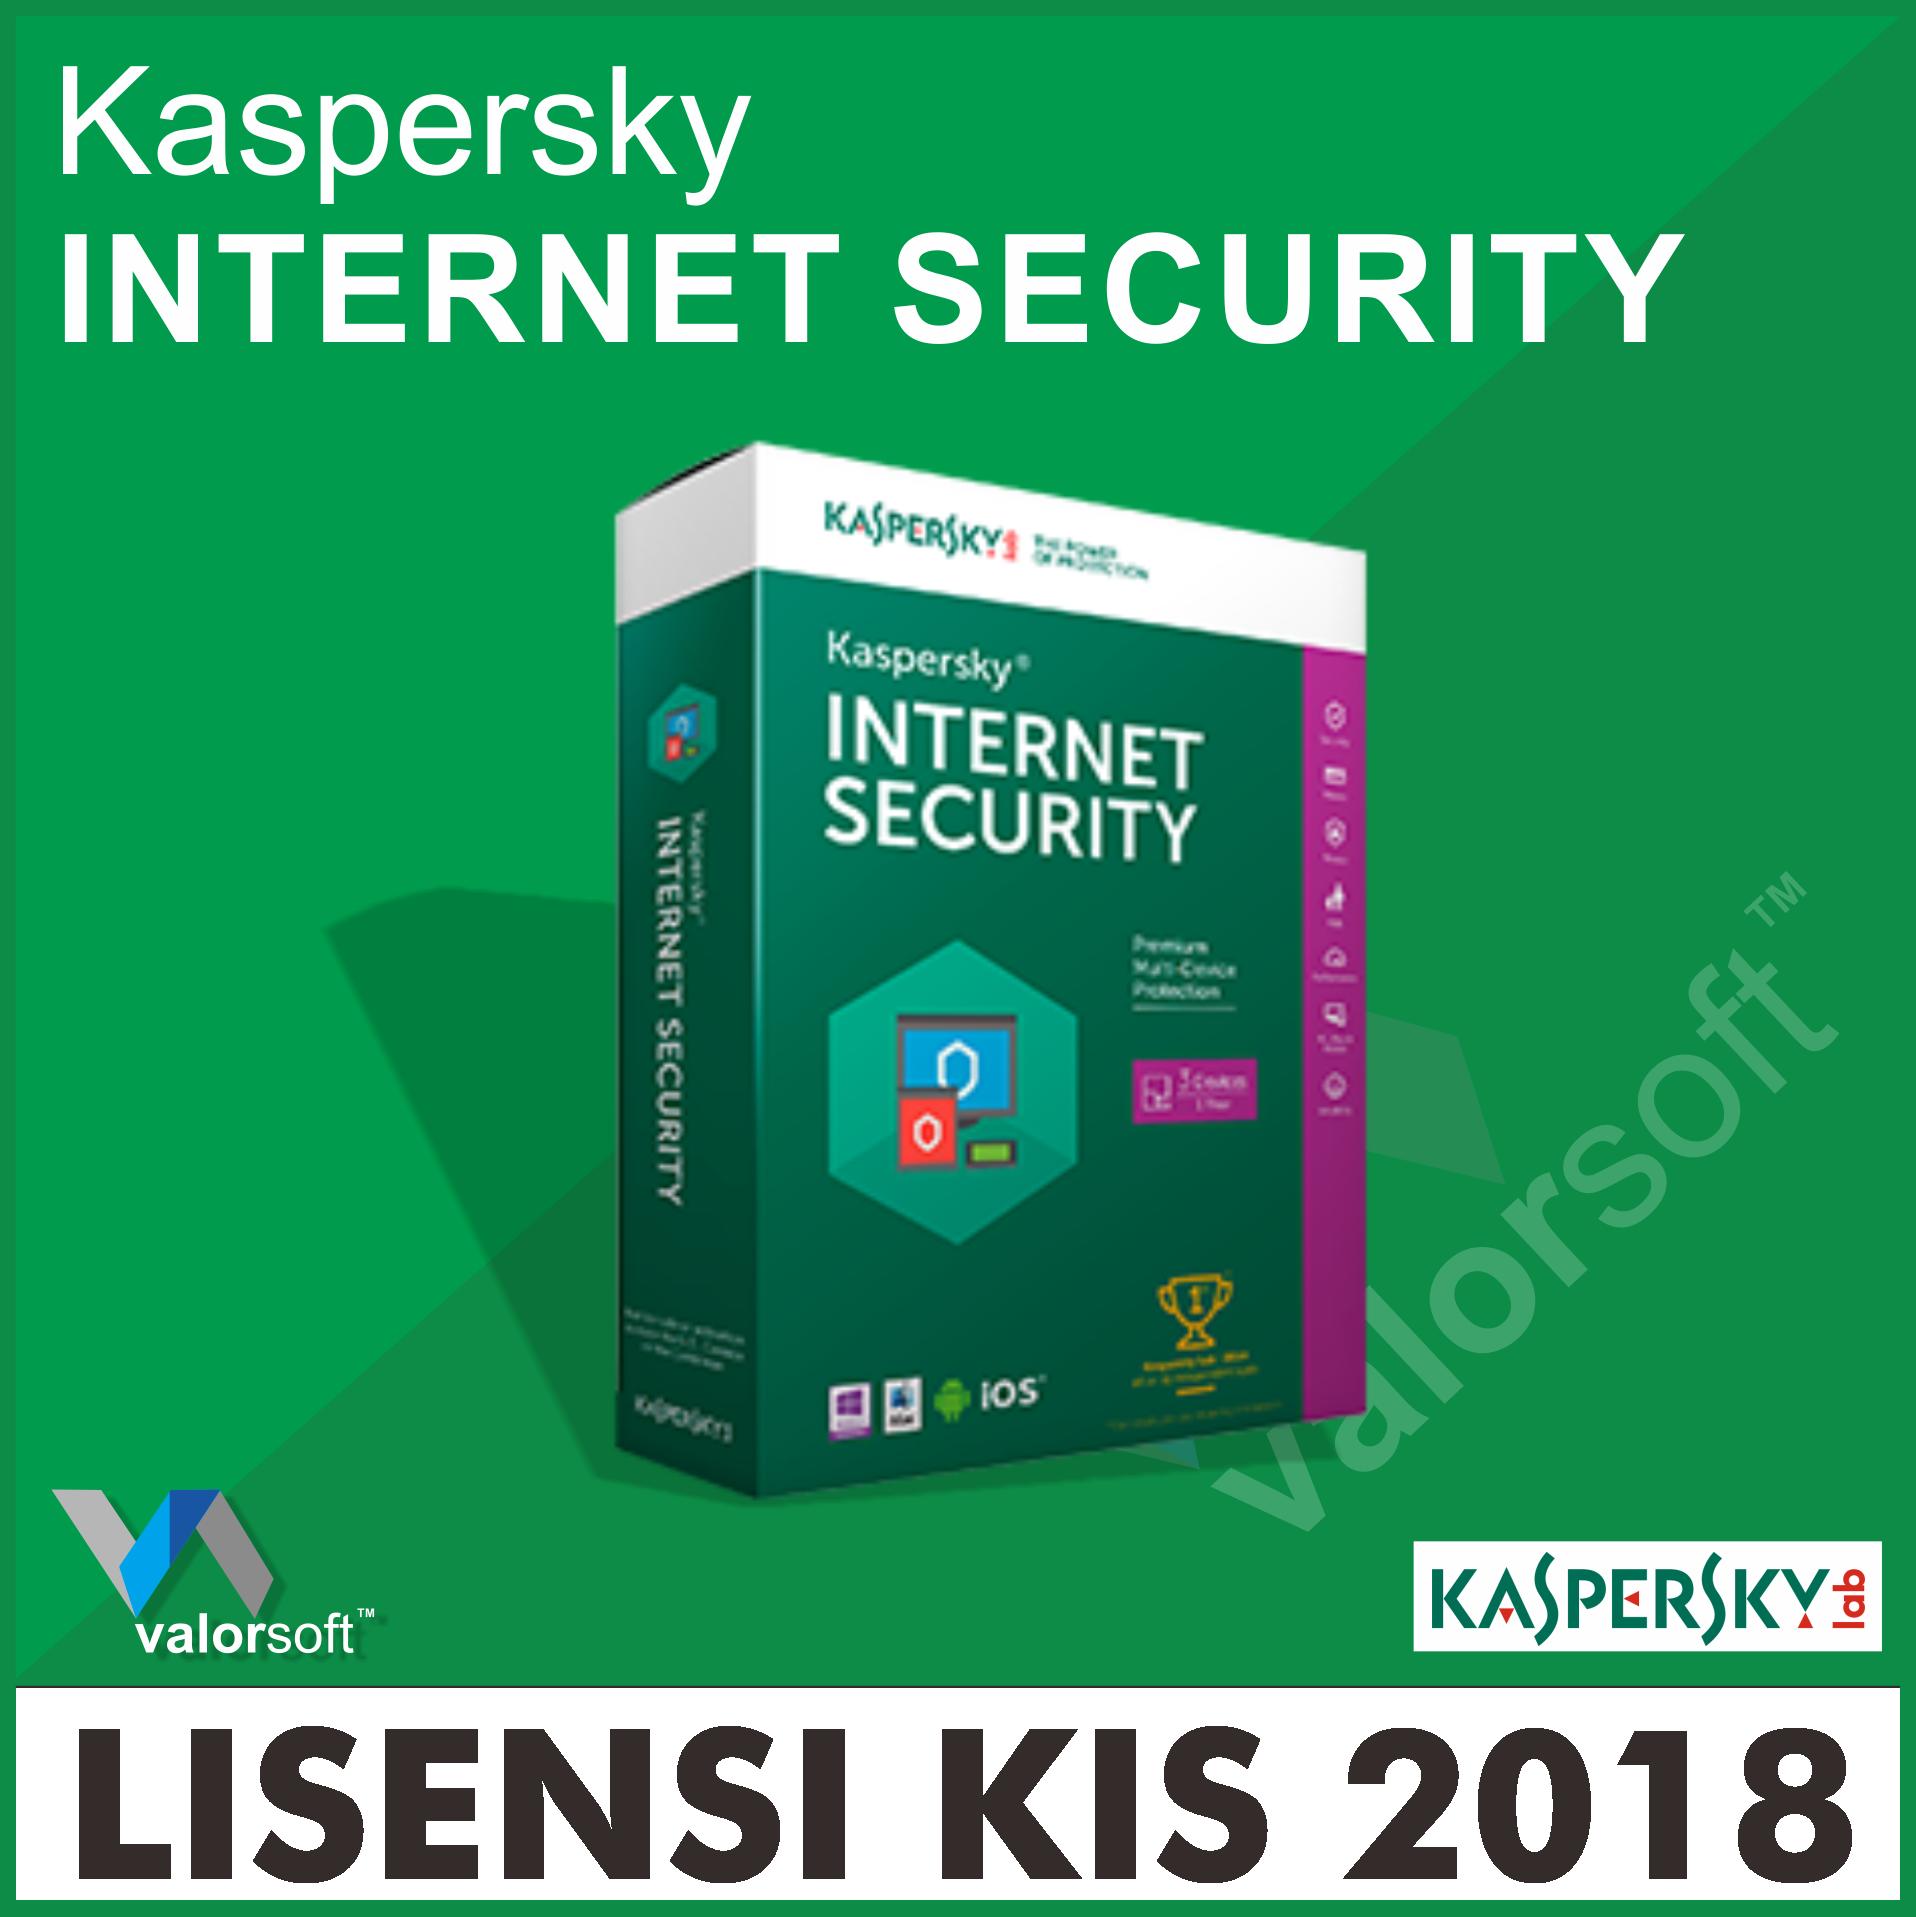 Jual Lisensi Kaspersky Internet Security 2018 1pc 1 Tahun Antivirus 4 Pc 2 Thn Original Valor Tokopedia